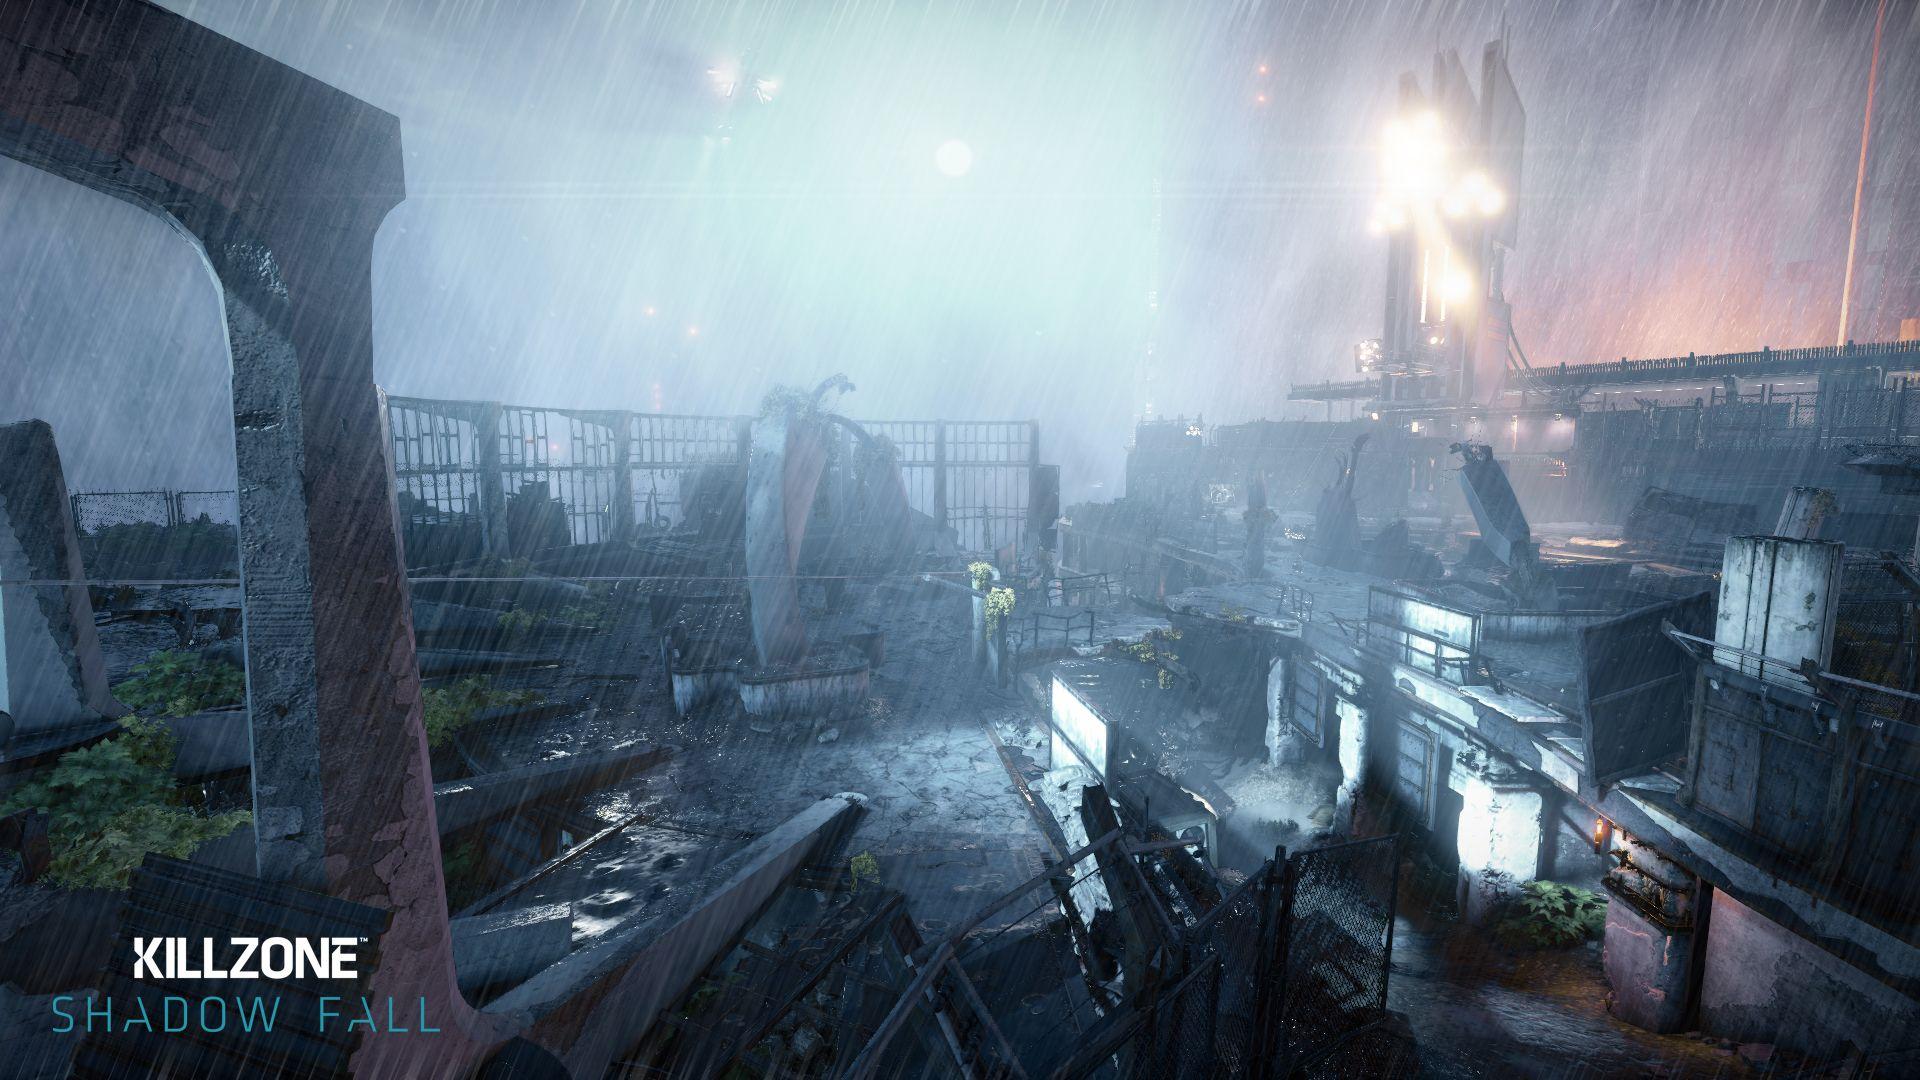 Killzone-ShadowFall PS4 Editeur 036